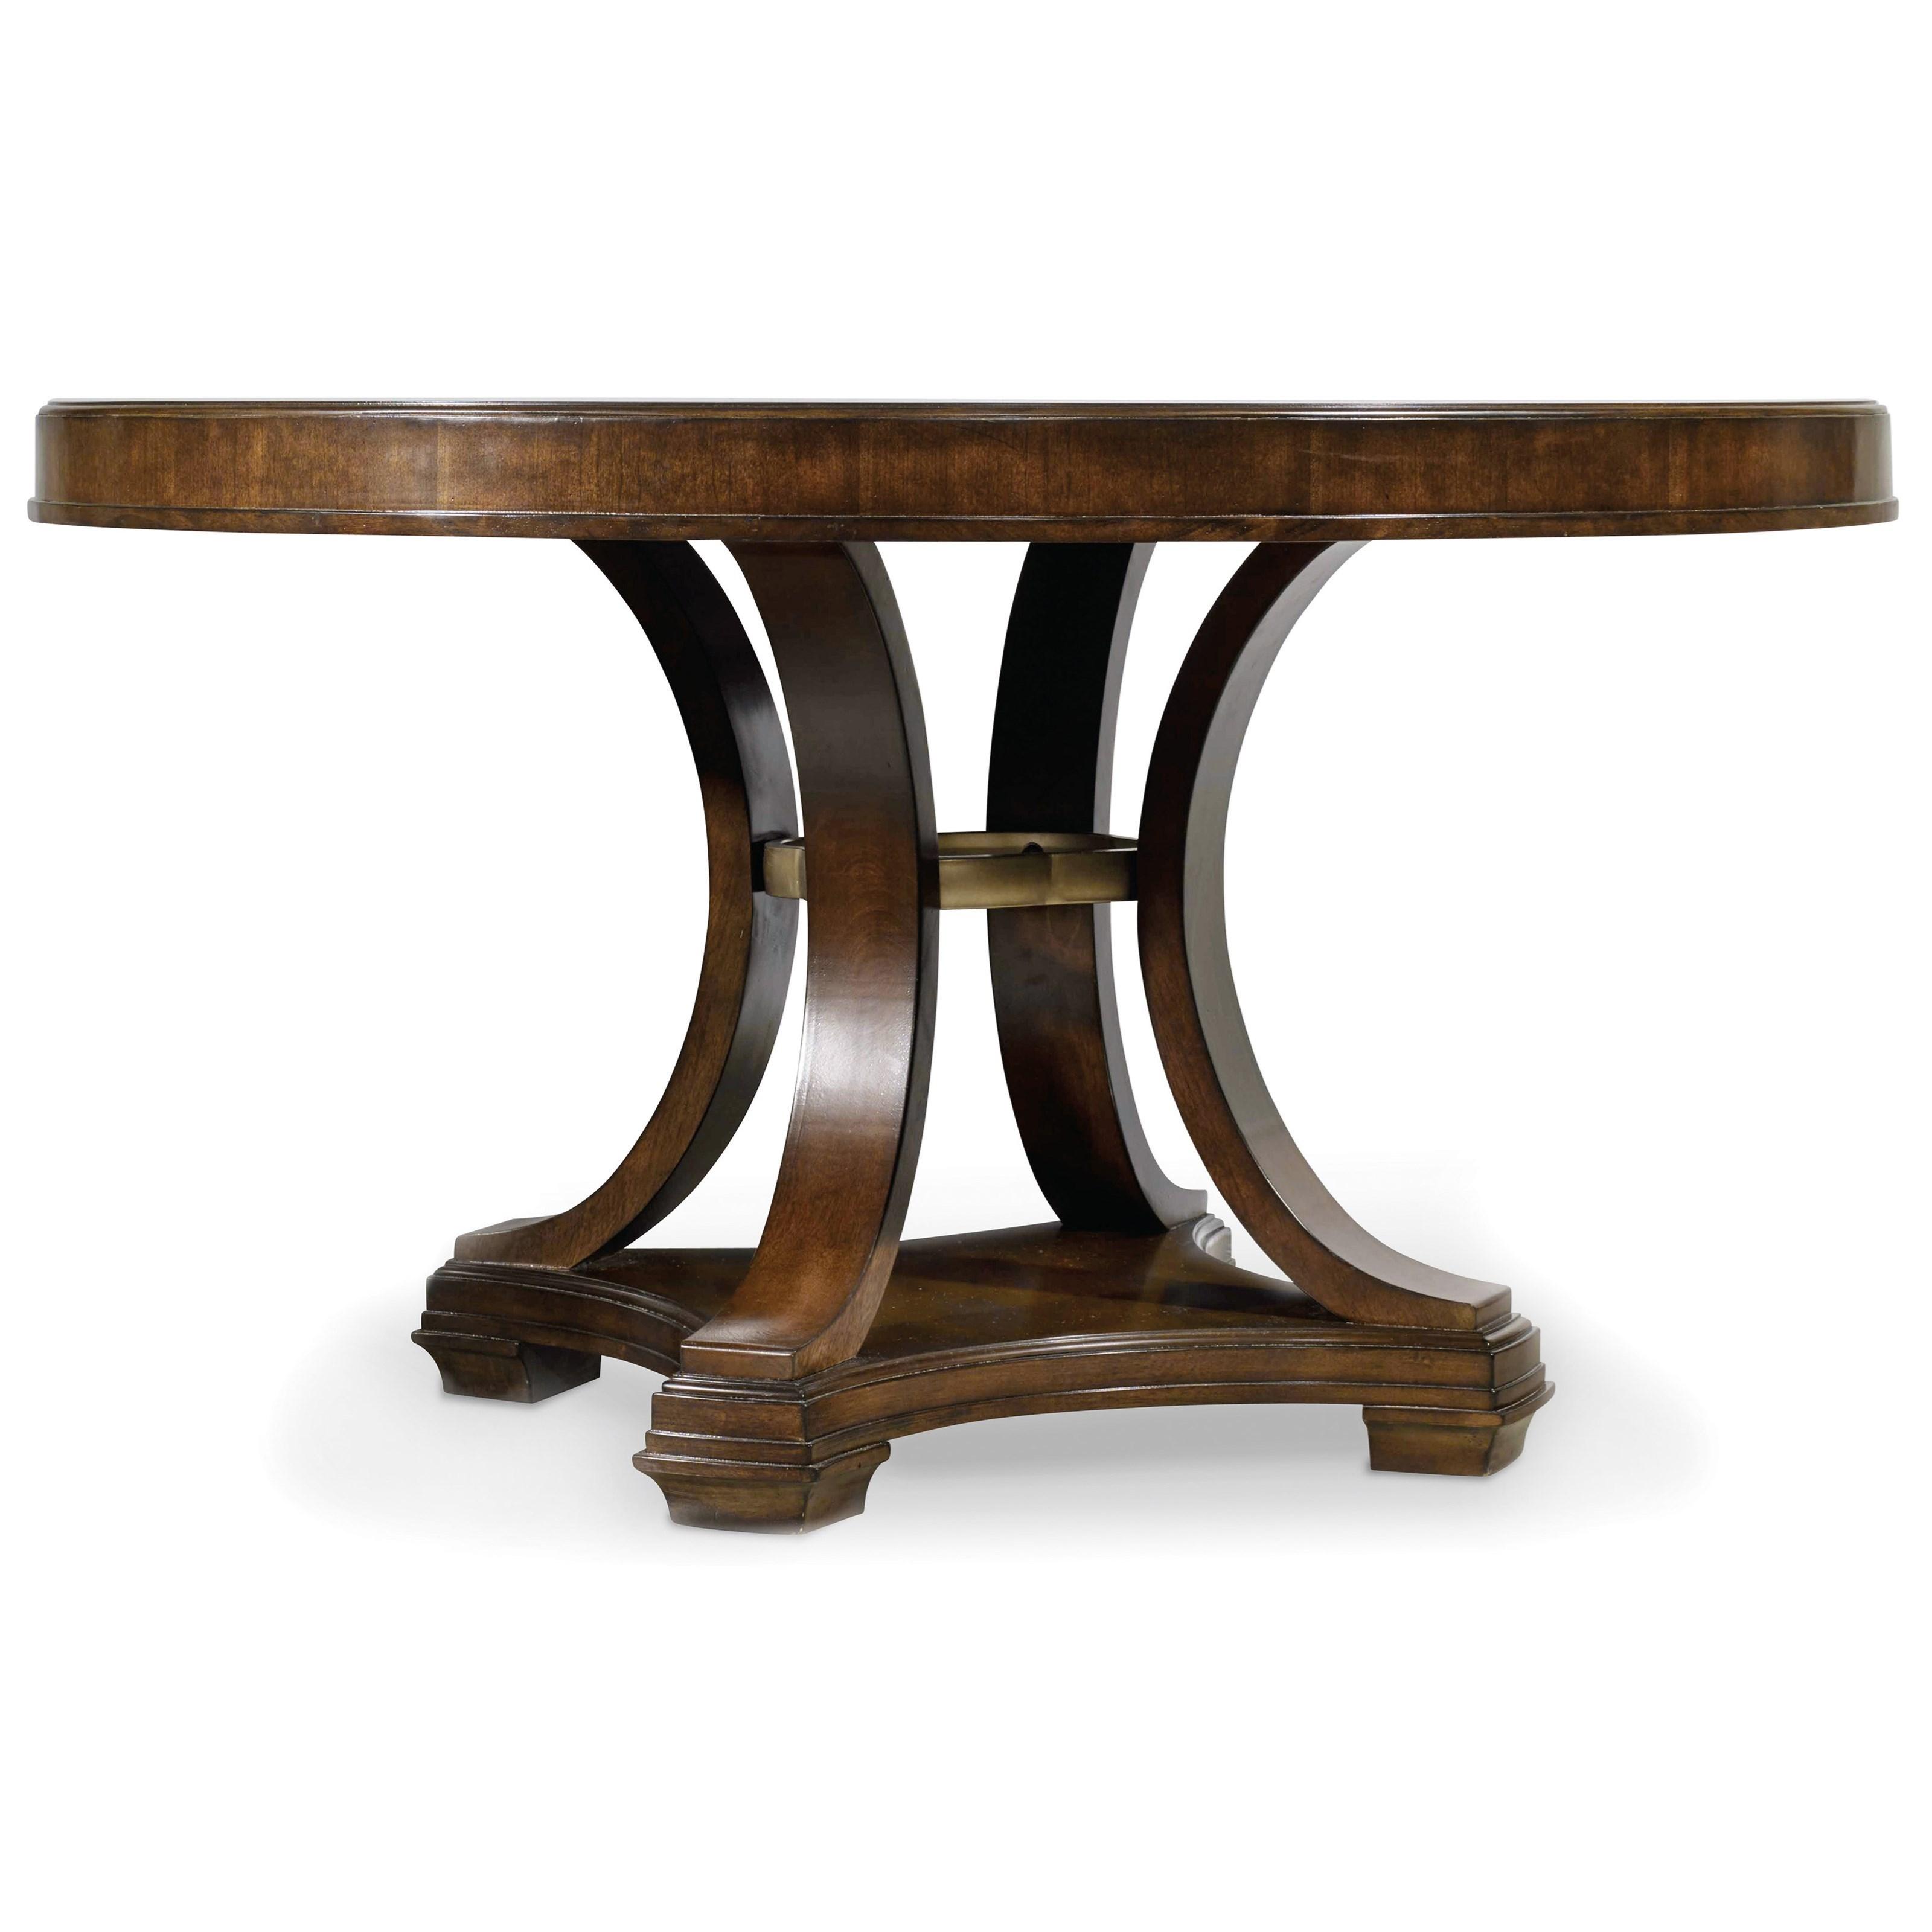 Hooker Furniture Skyline Round Dining Table - Item Number: 5336-75203